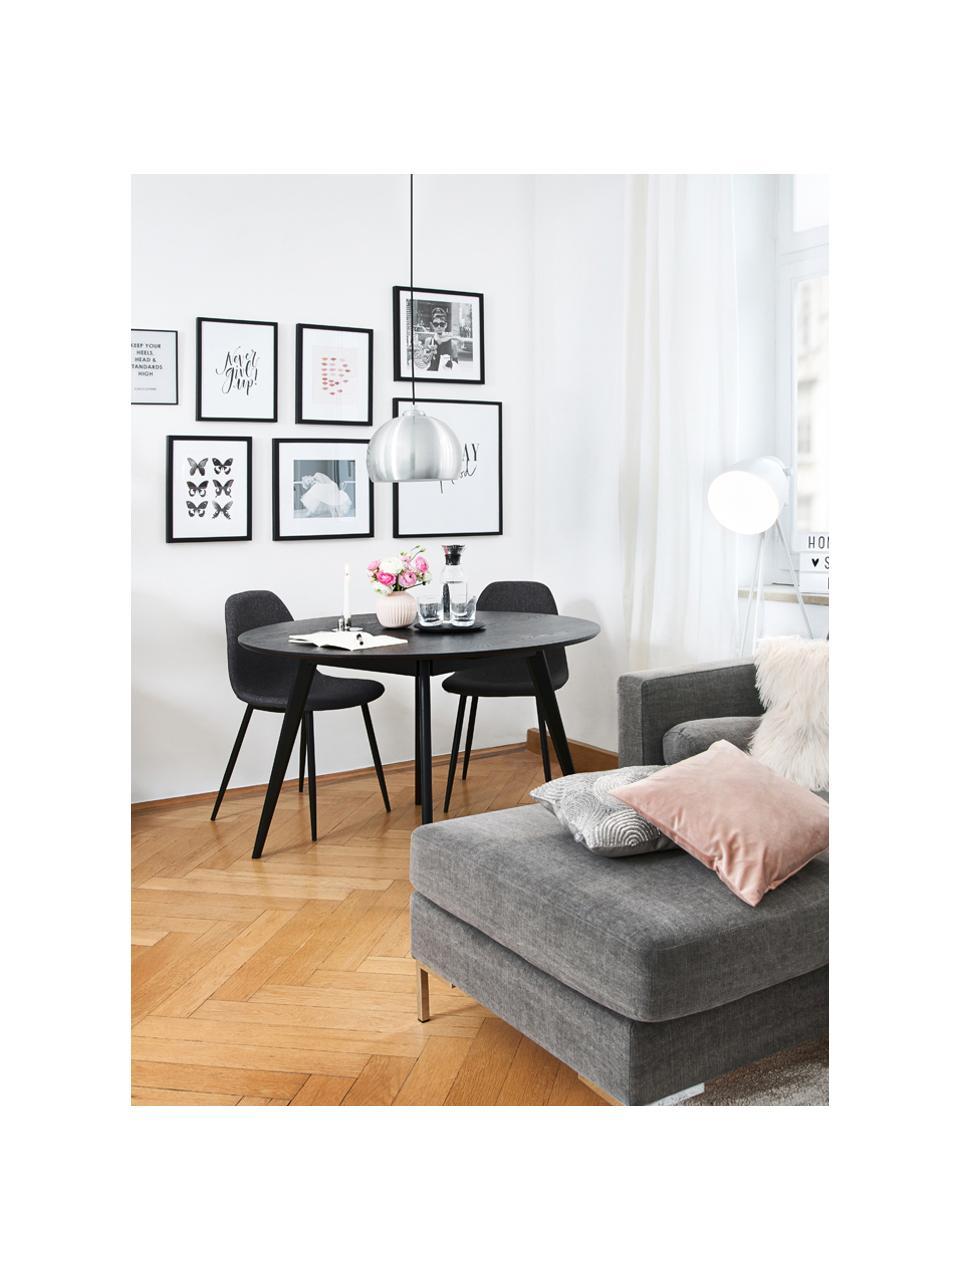 Gestoffeerde stoelen Karla in donkergrijs, 2 stuks, Bekleding: 100% polyester, Poten: metaal, Bekleding: donkergrijs. Poten: zwart, B 44 x D 53 cm